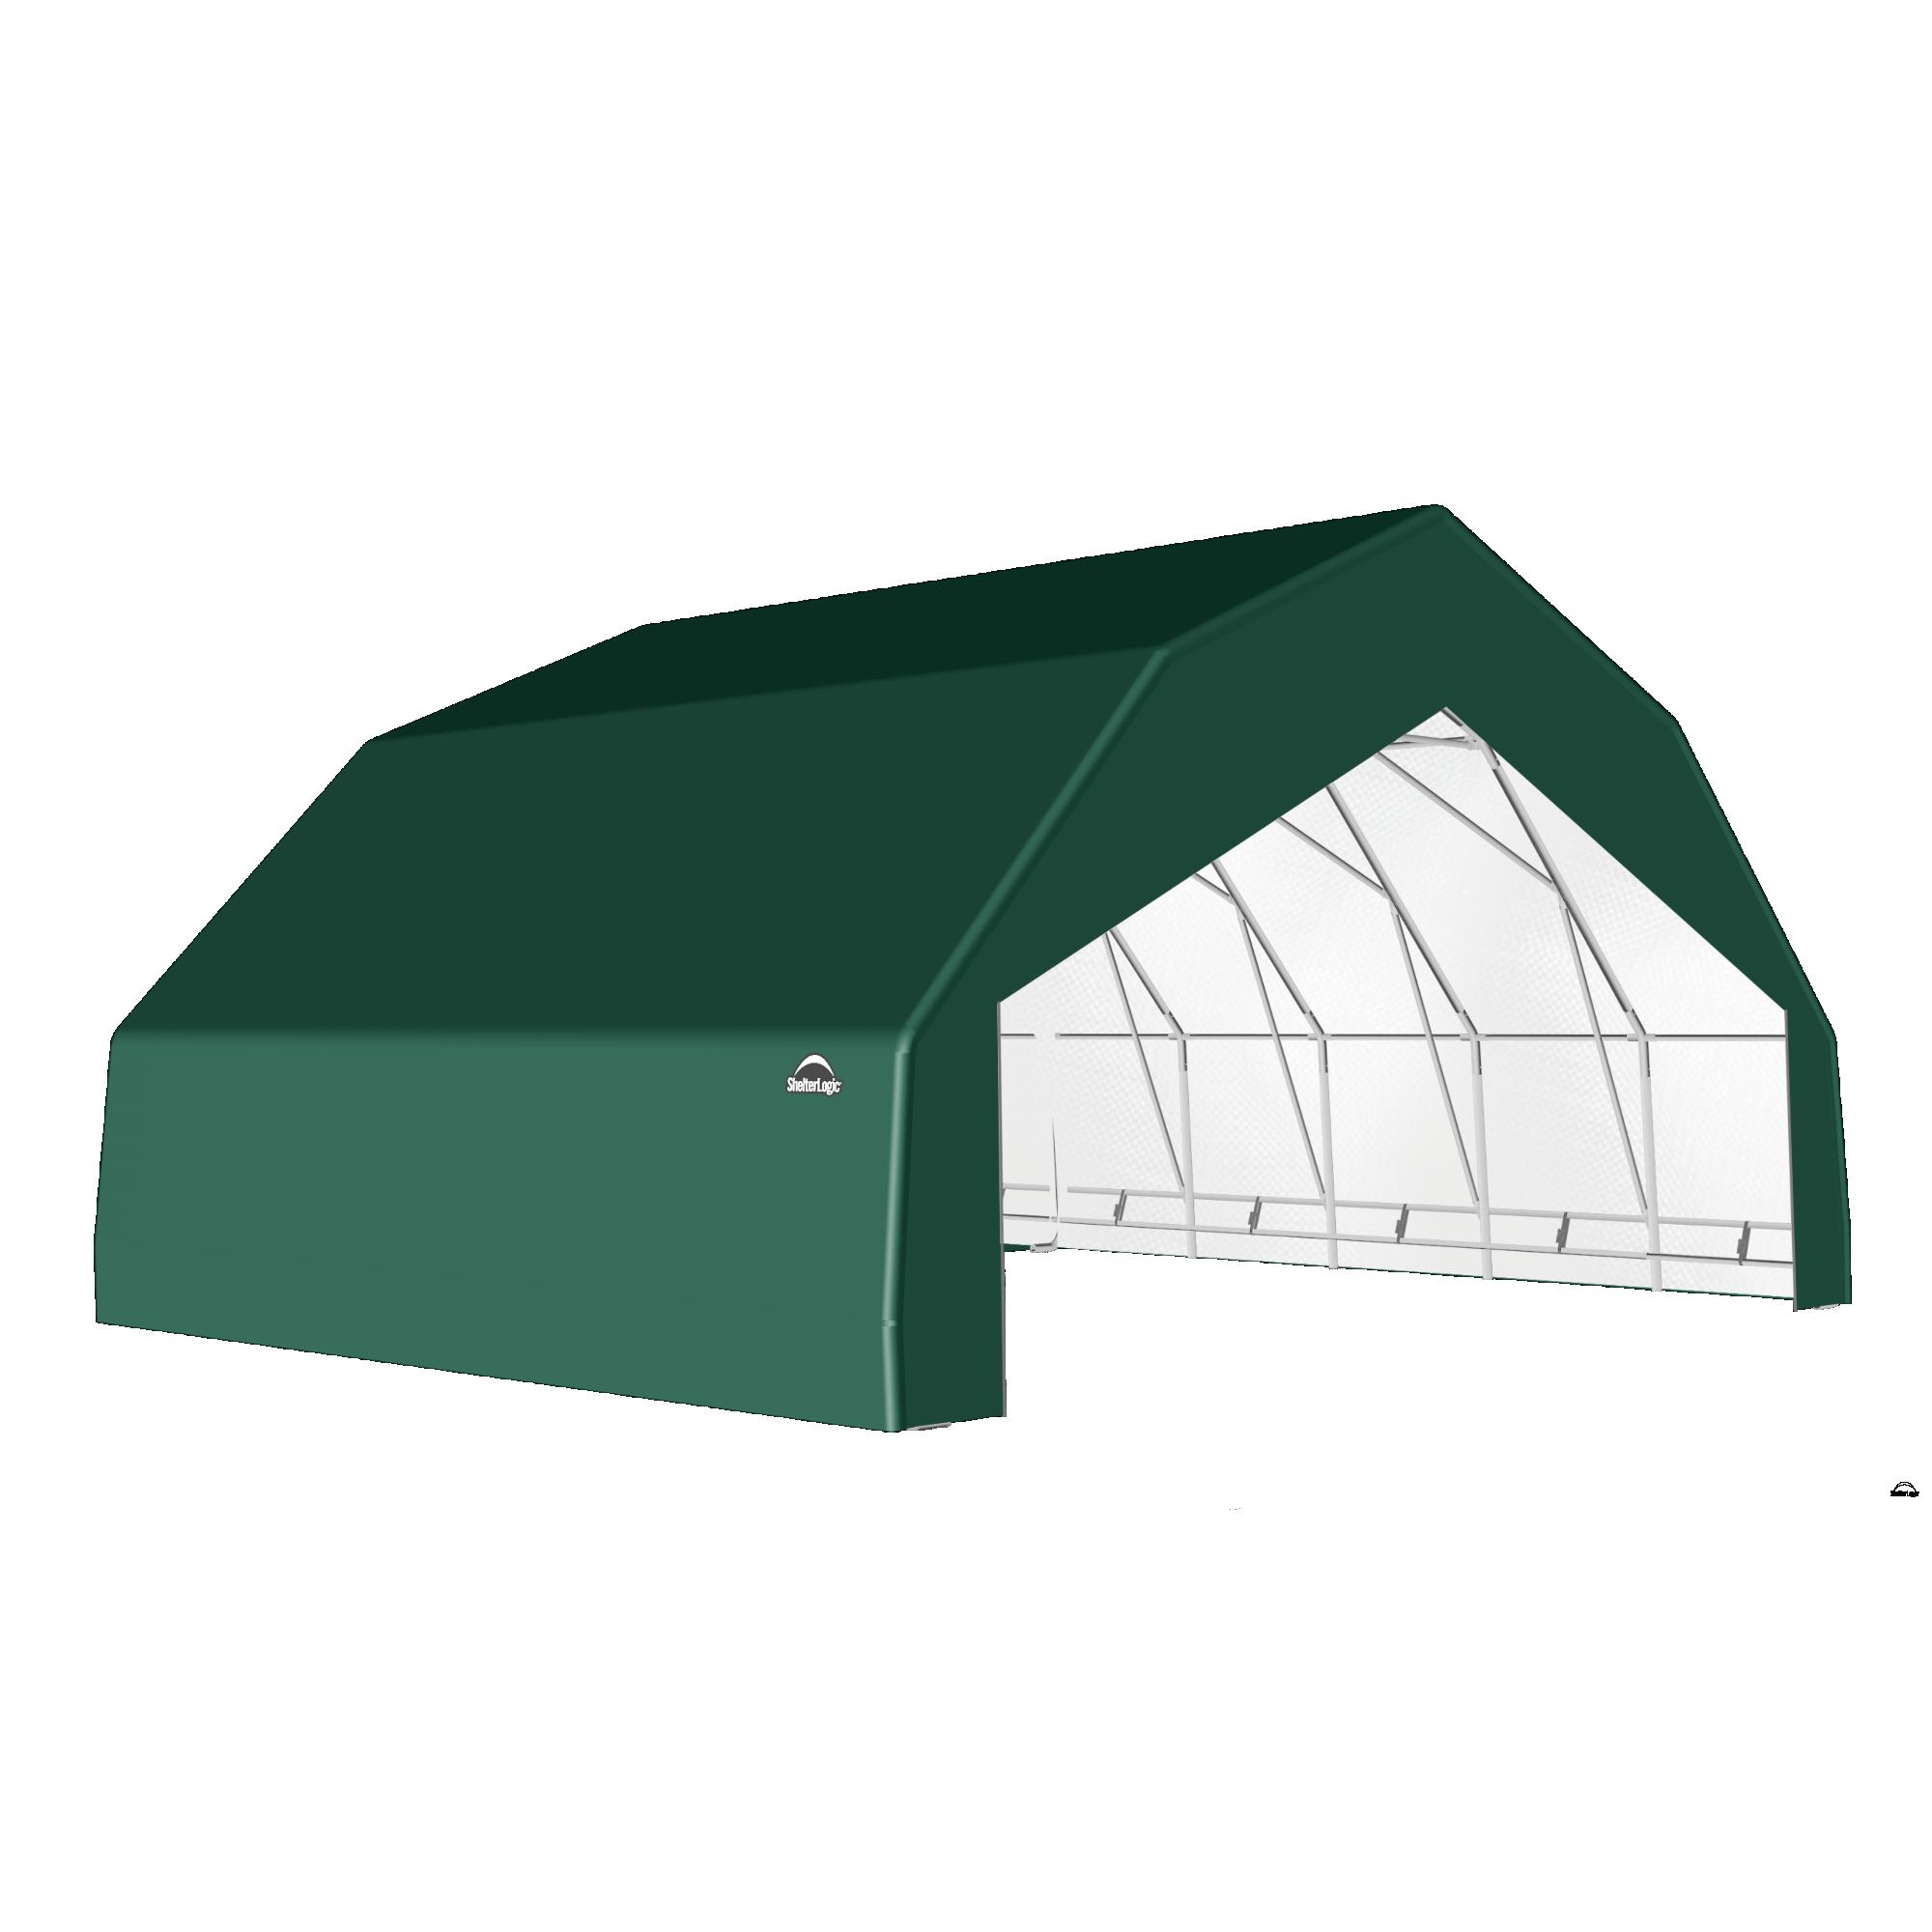 SP Barn 30X28X15 Green 14 oz PE Shelter